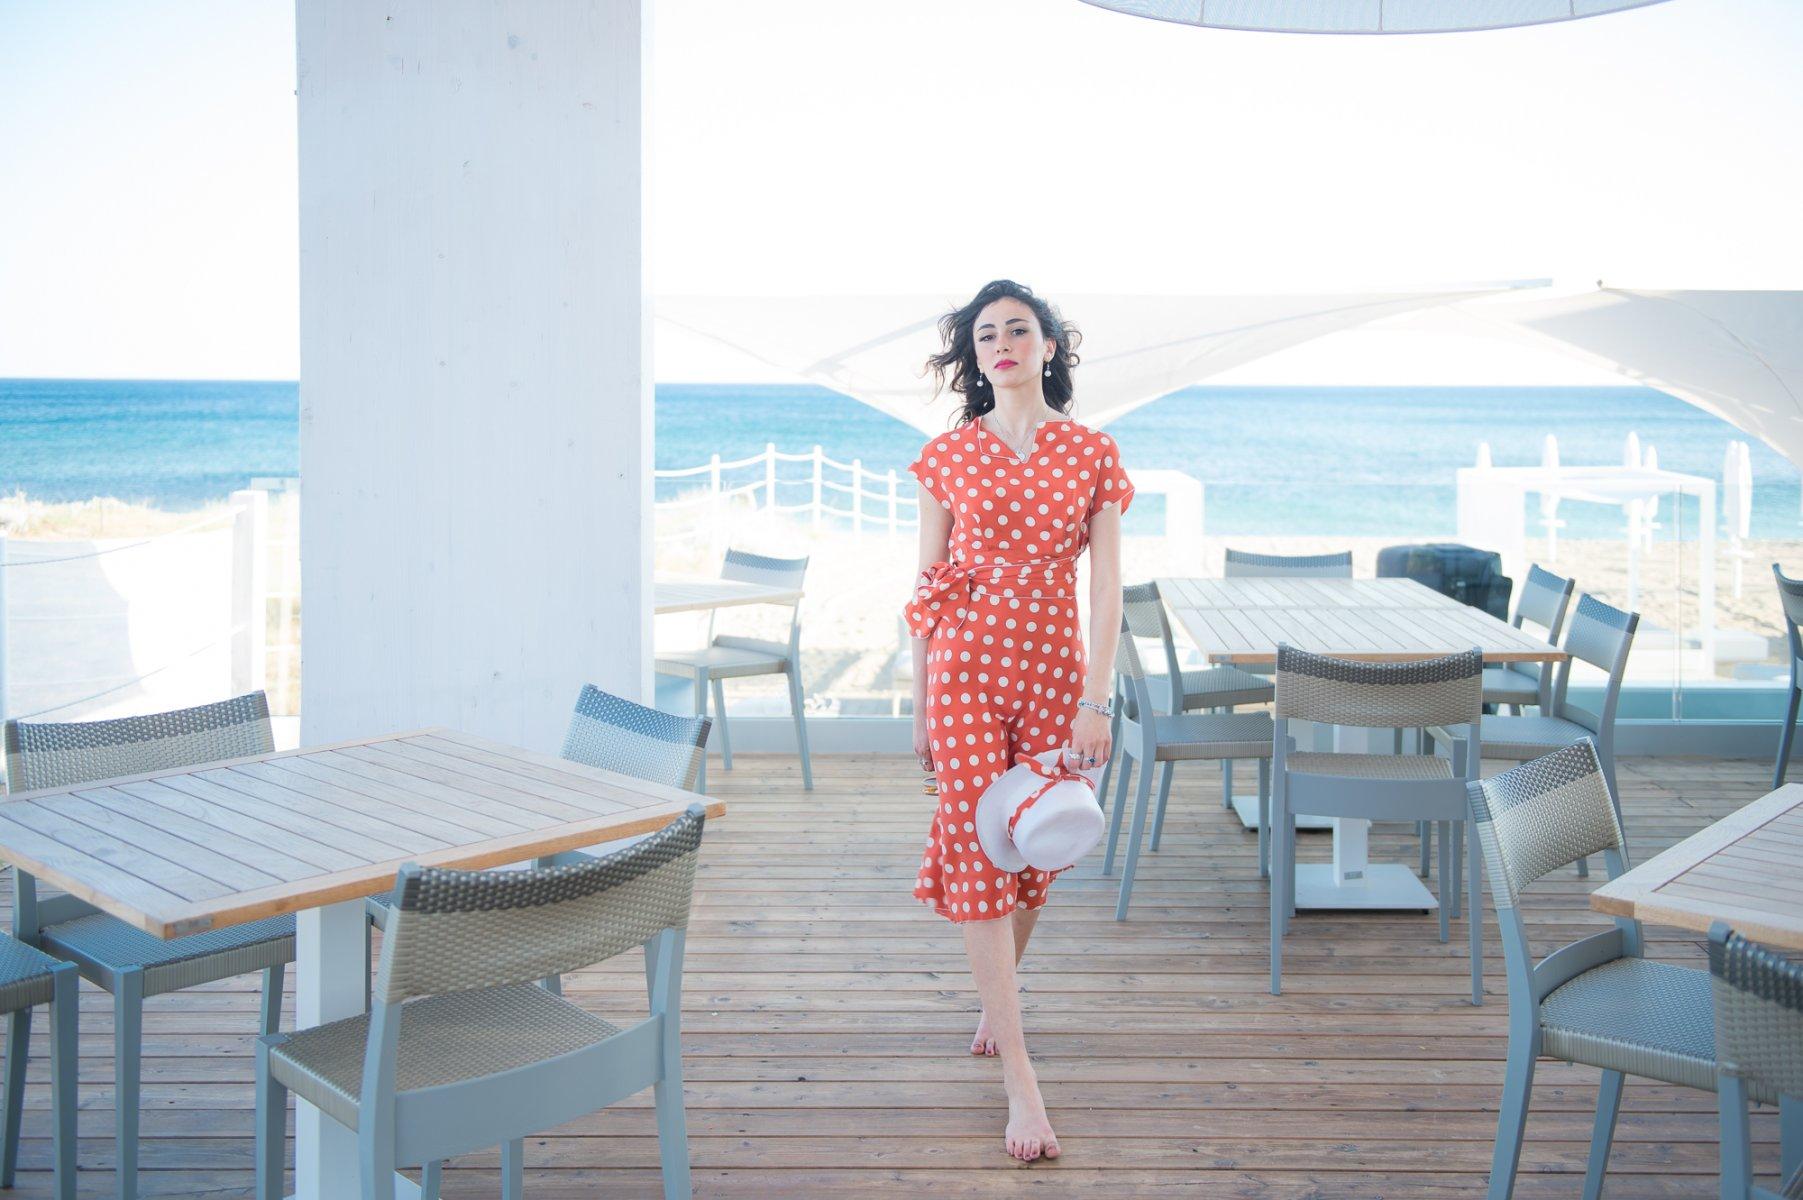 208-Pretty_Woman_MMD9588 Fashion/Adv